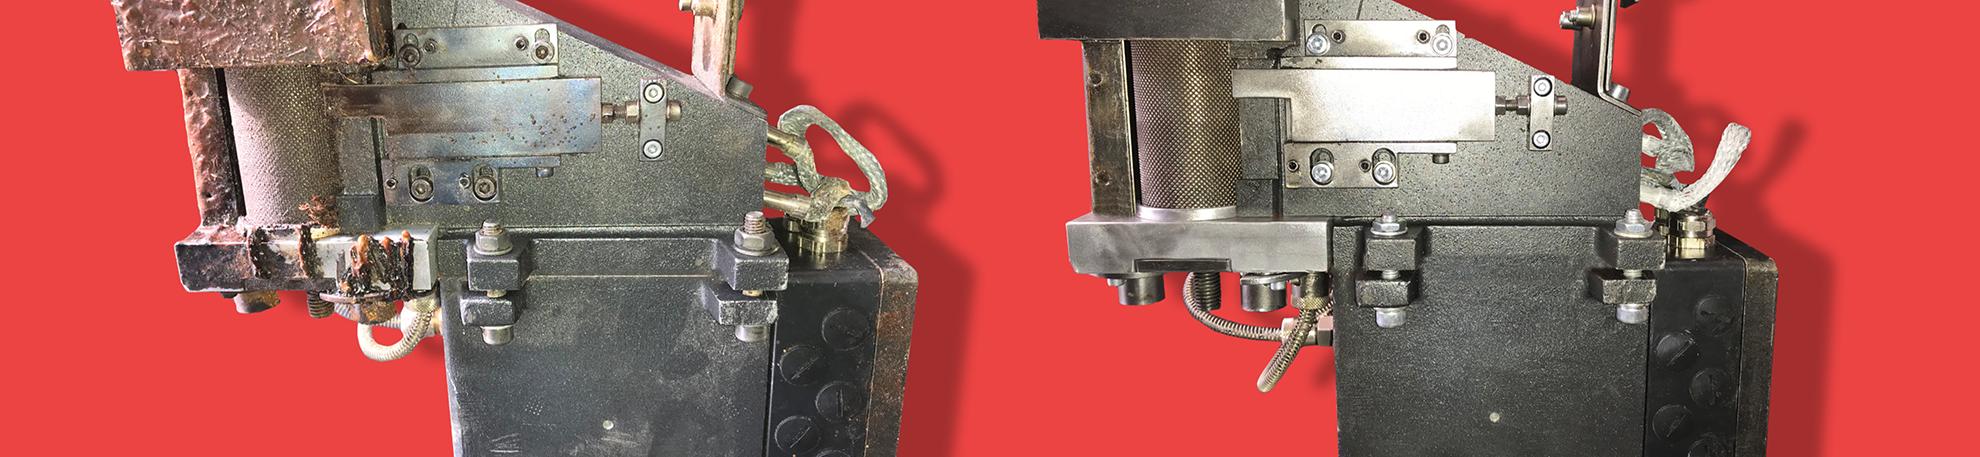 IMA Schelling - Glue Pot Repair